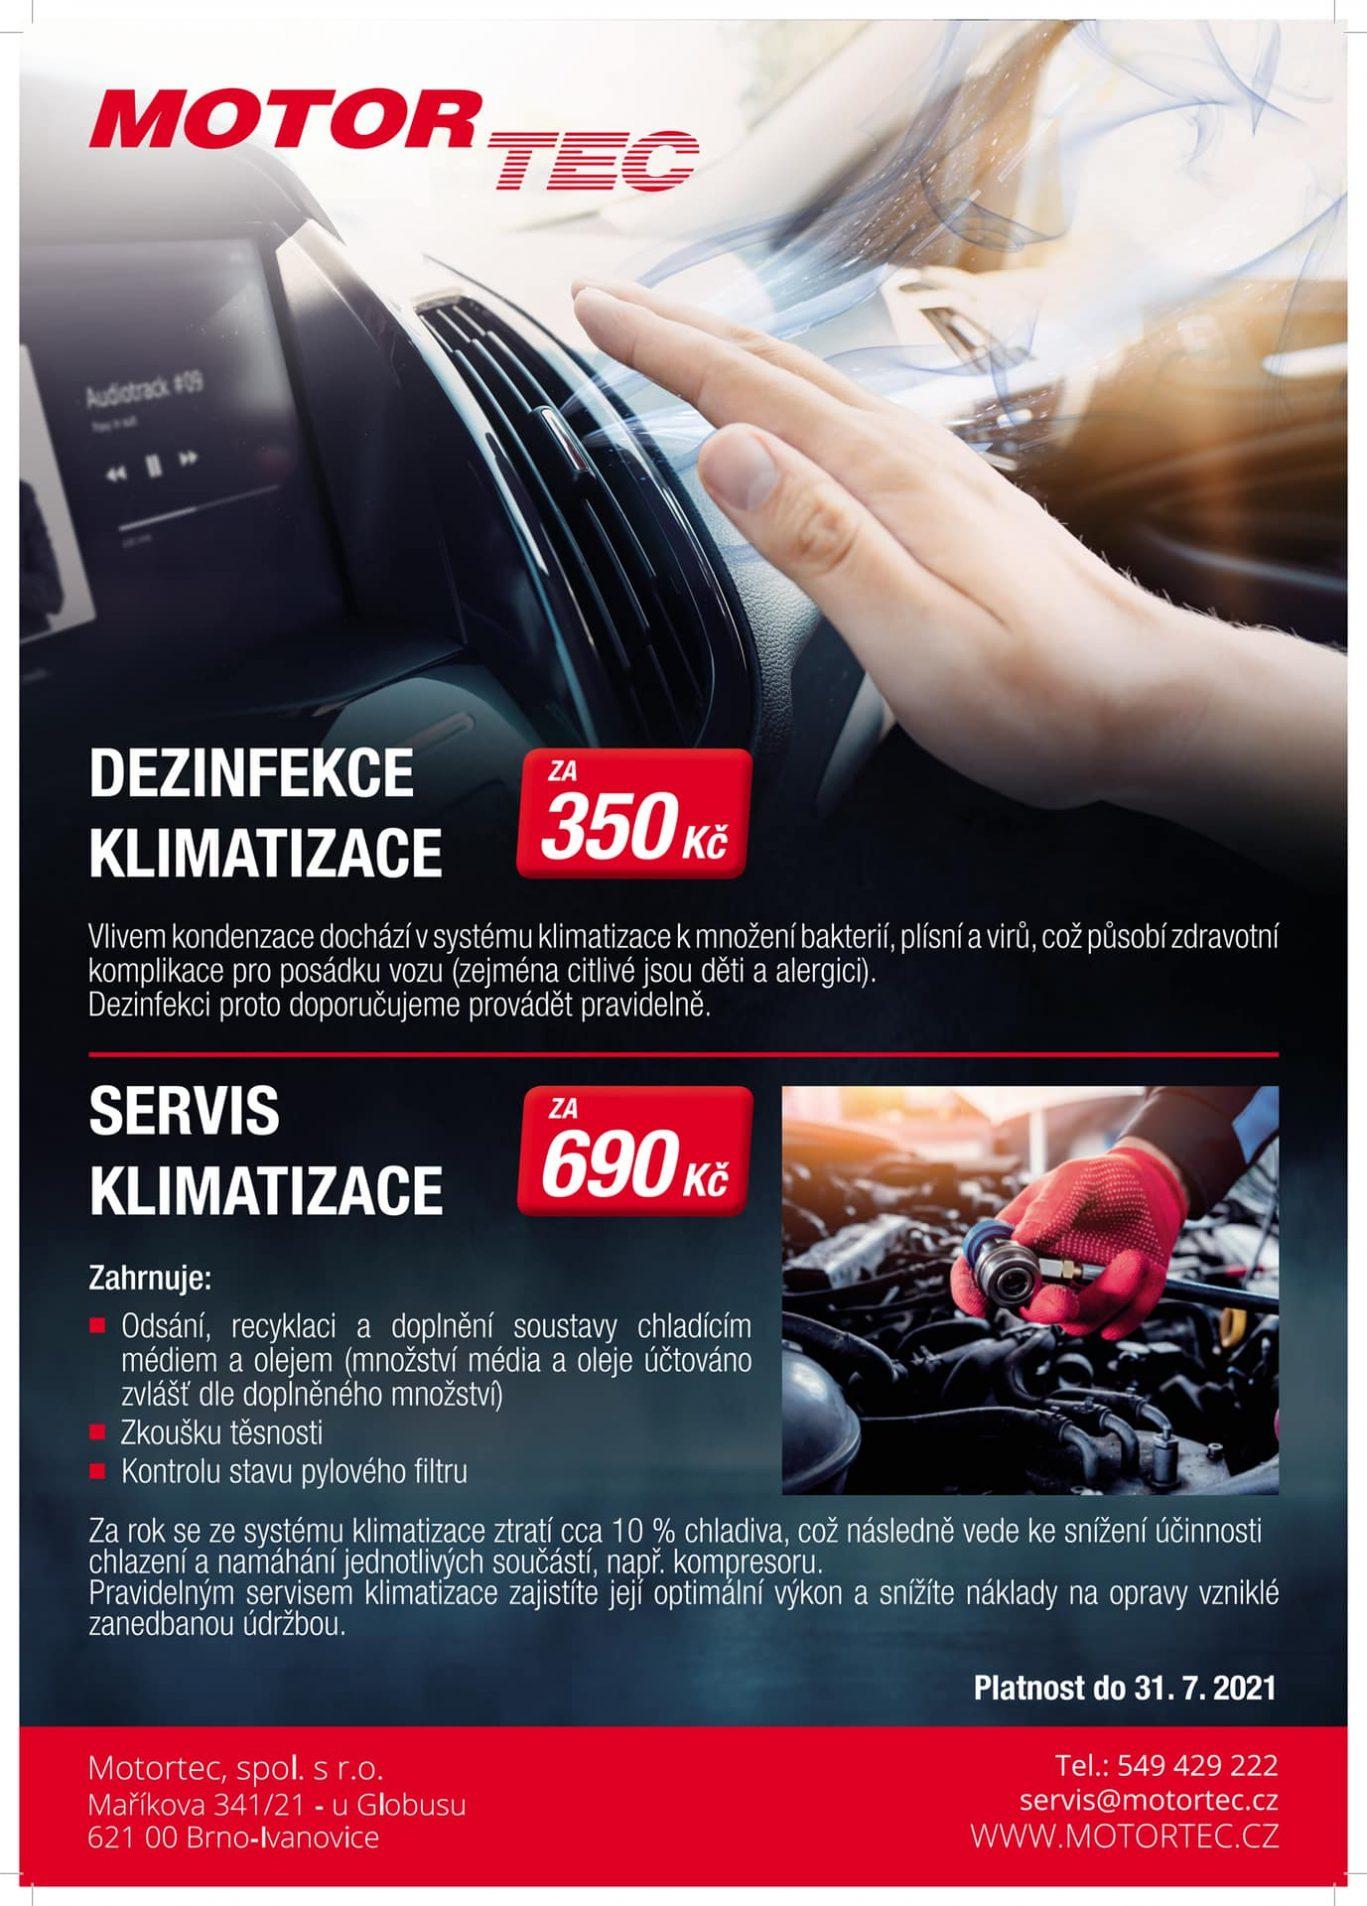 Servis a dezinfekce klimatizace MOTORTEC Brno